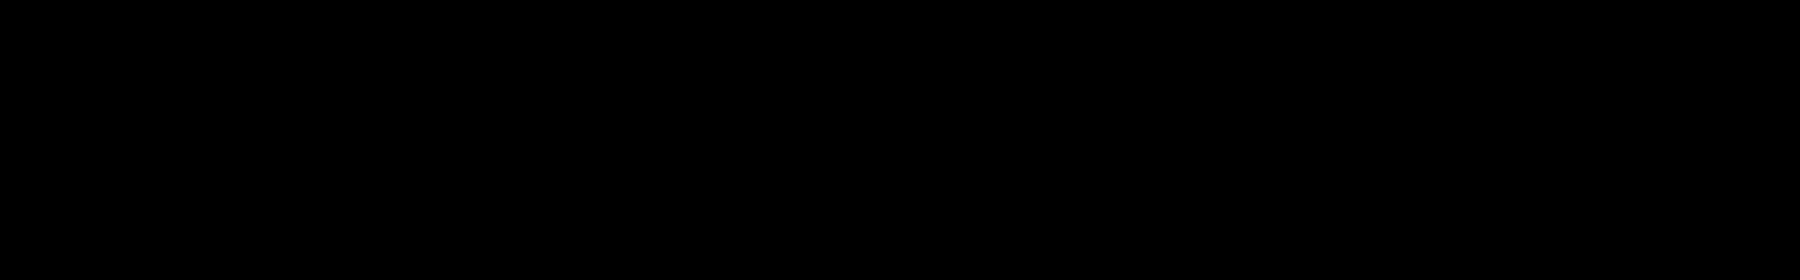 Astroworld audio waveform